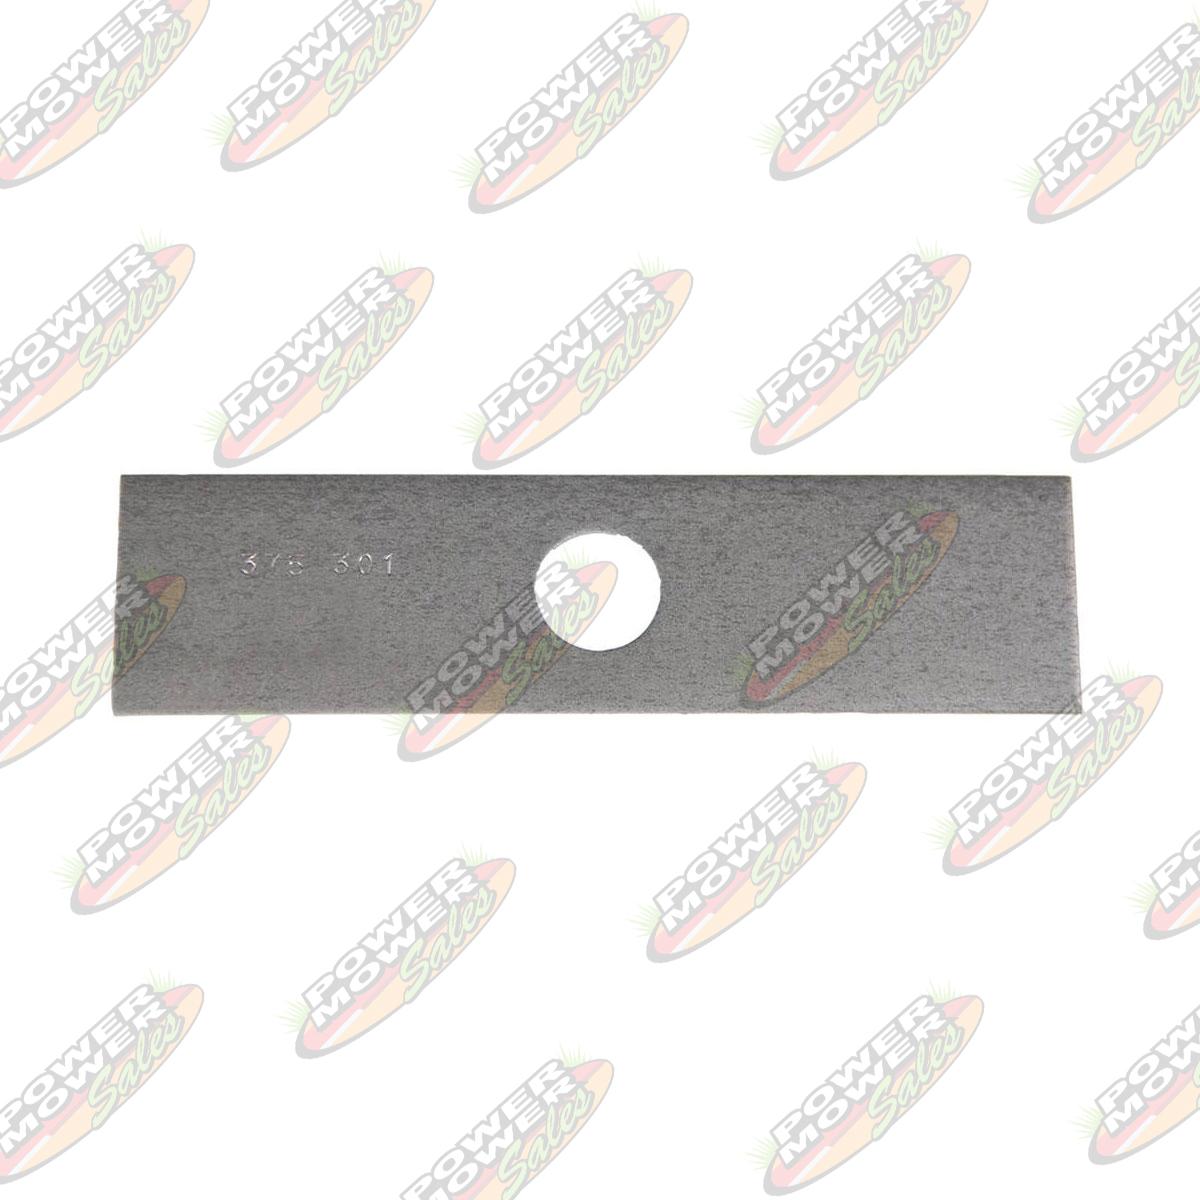 New Stens 375-301 Edger Blade Echo 720237001